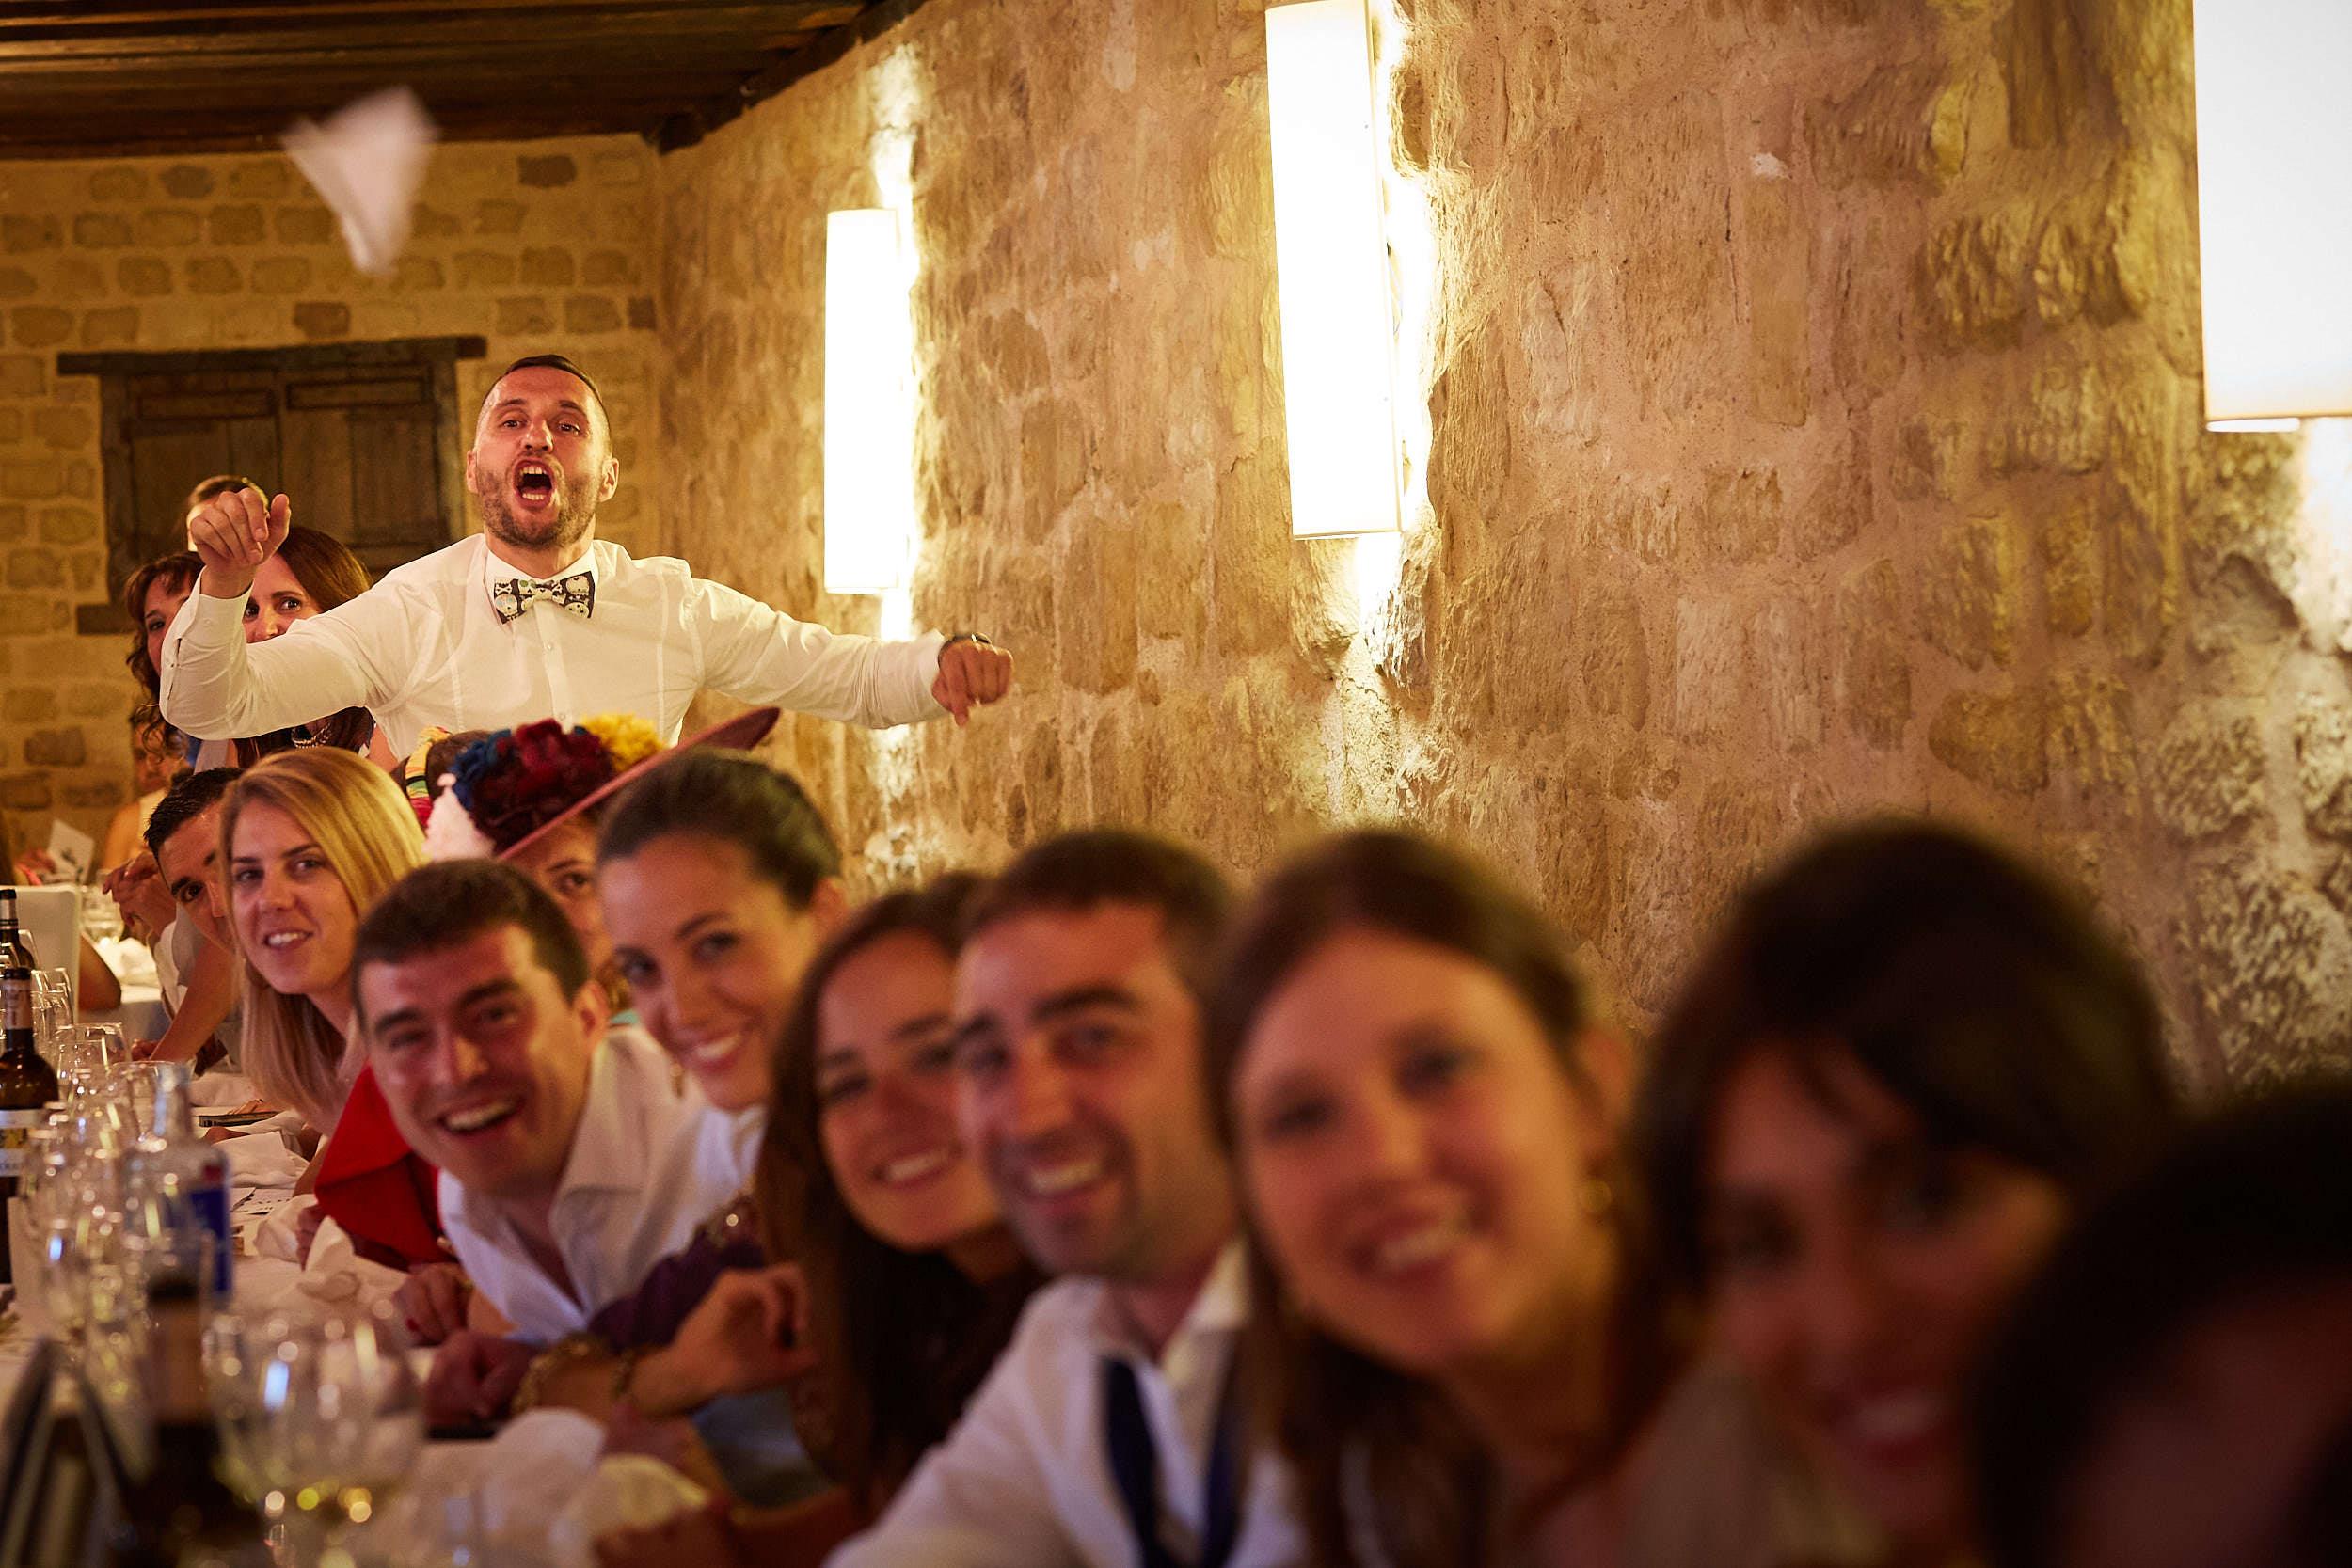 Rioja Wedding Photographer Isobel David Palacio Casafuerte Zarraton La Rioja Spain James Sturcke Photographer sturcke.org_00026.jpg